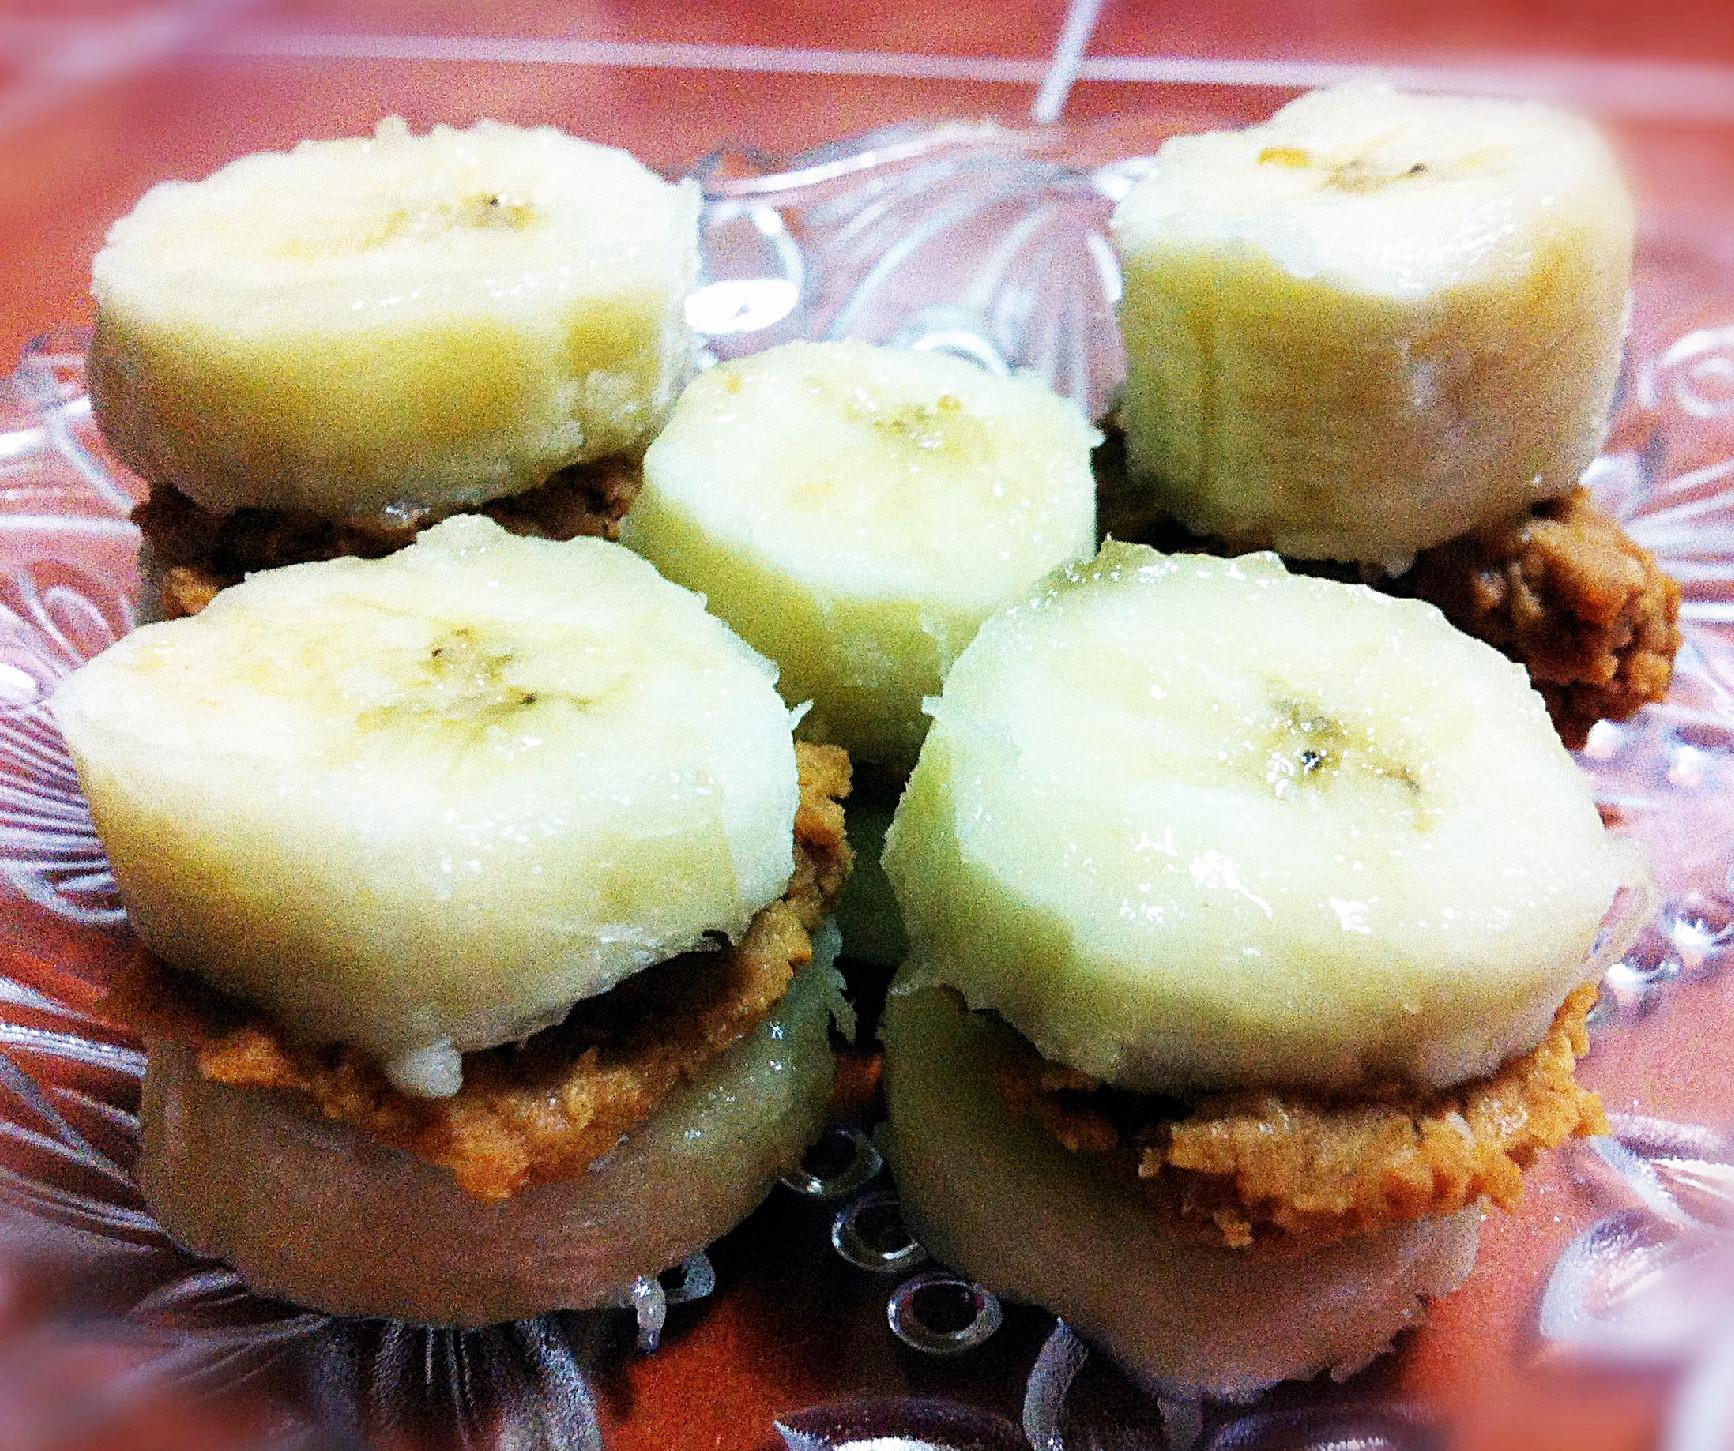 Healthy Banana Desserts  Healthy Dessert Ideas Banana and Peanut Butter Bites